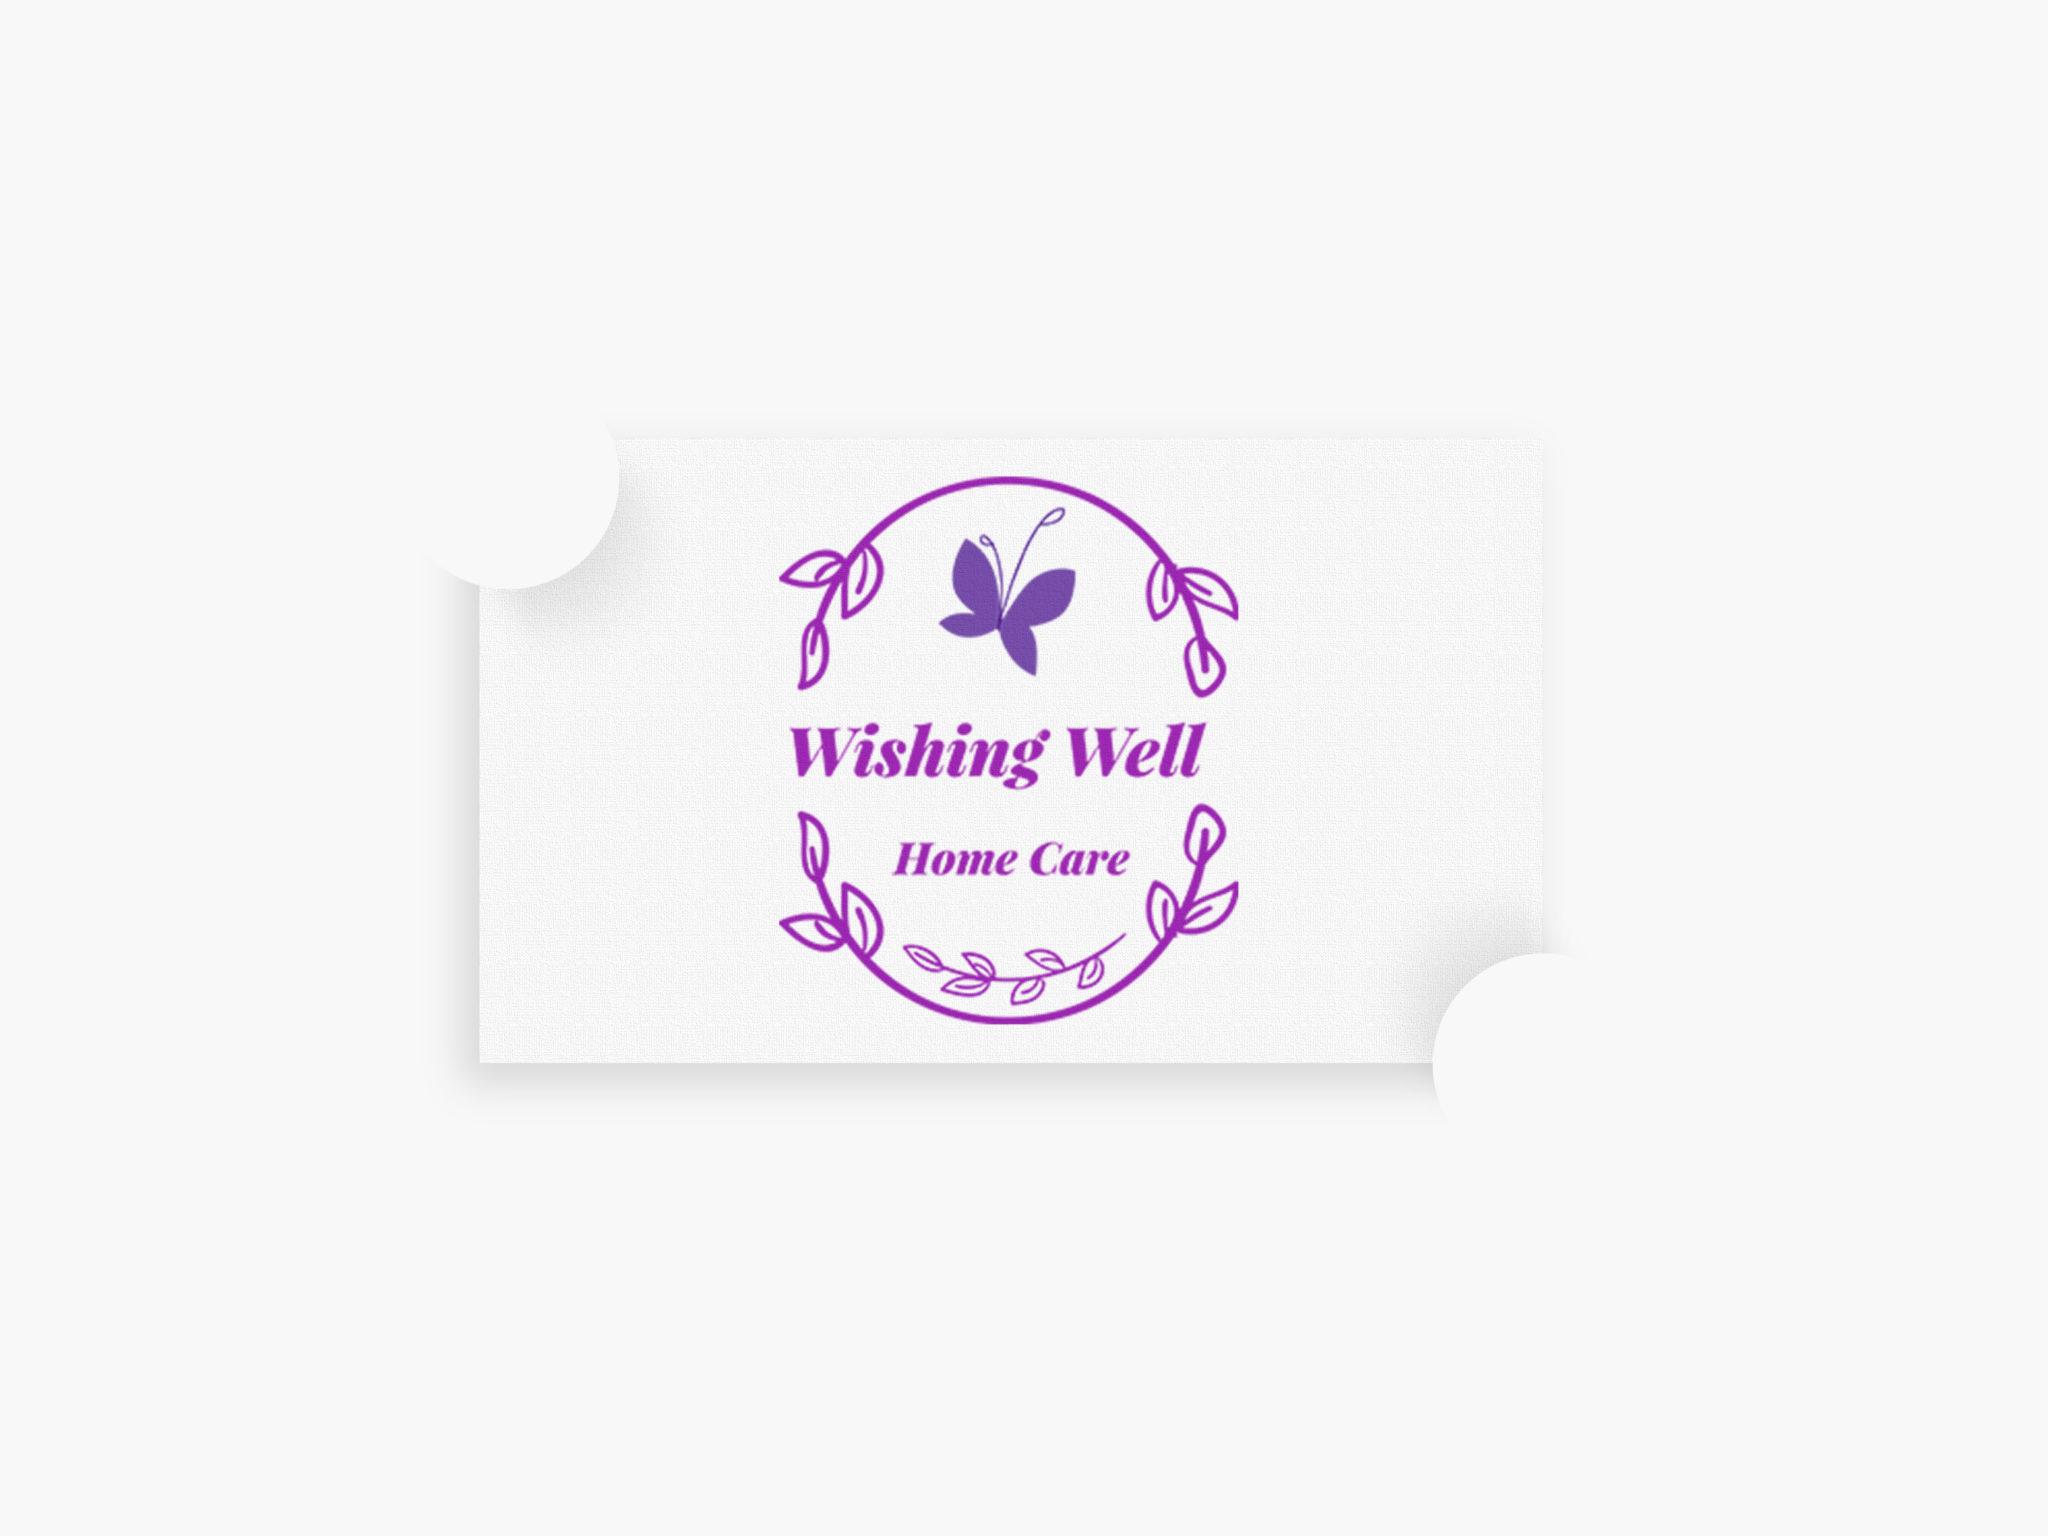 Wishing Well Home Care Logo